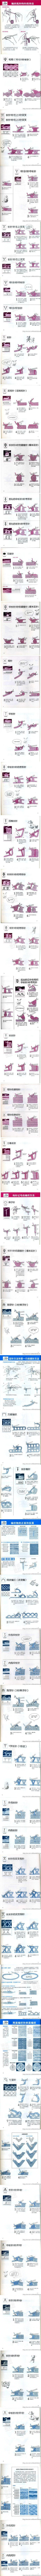 crochet techniques and stitches